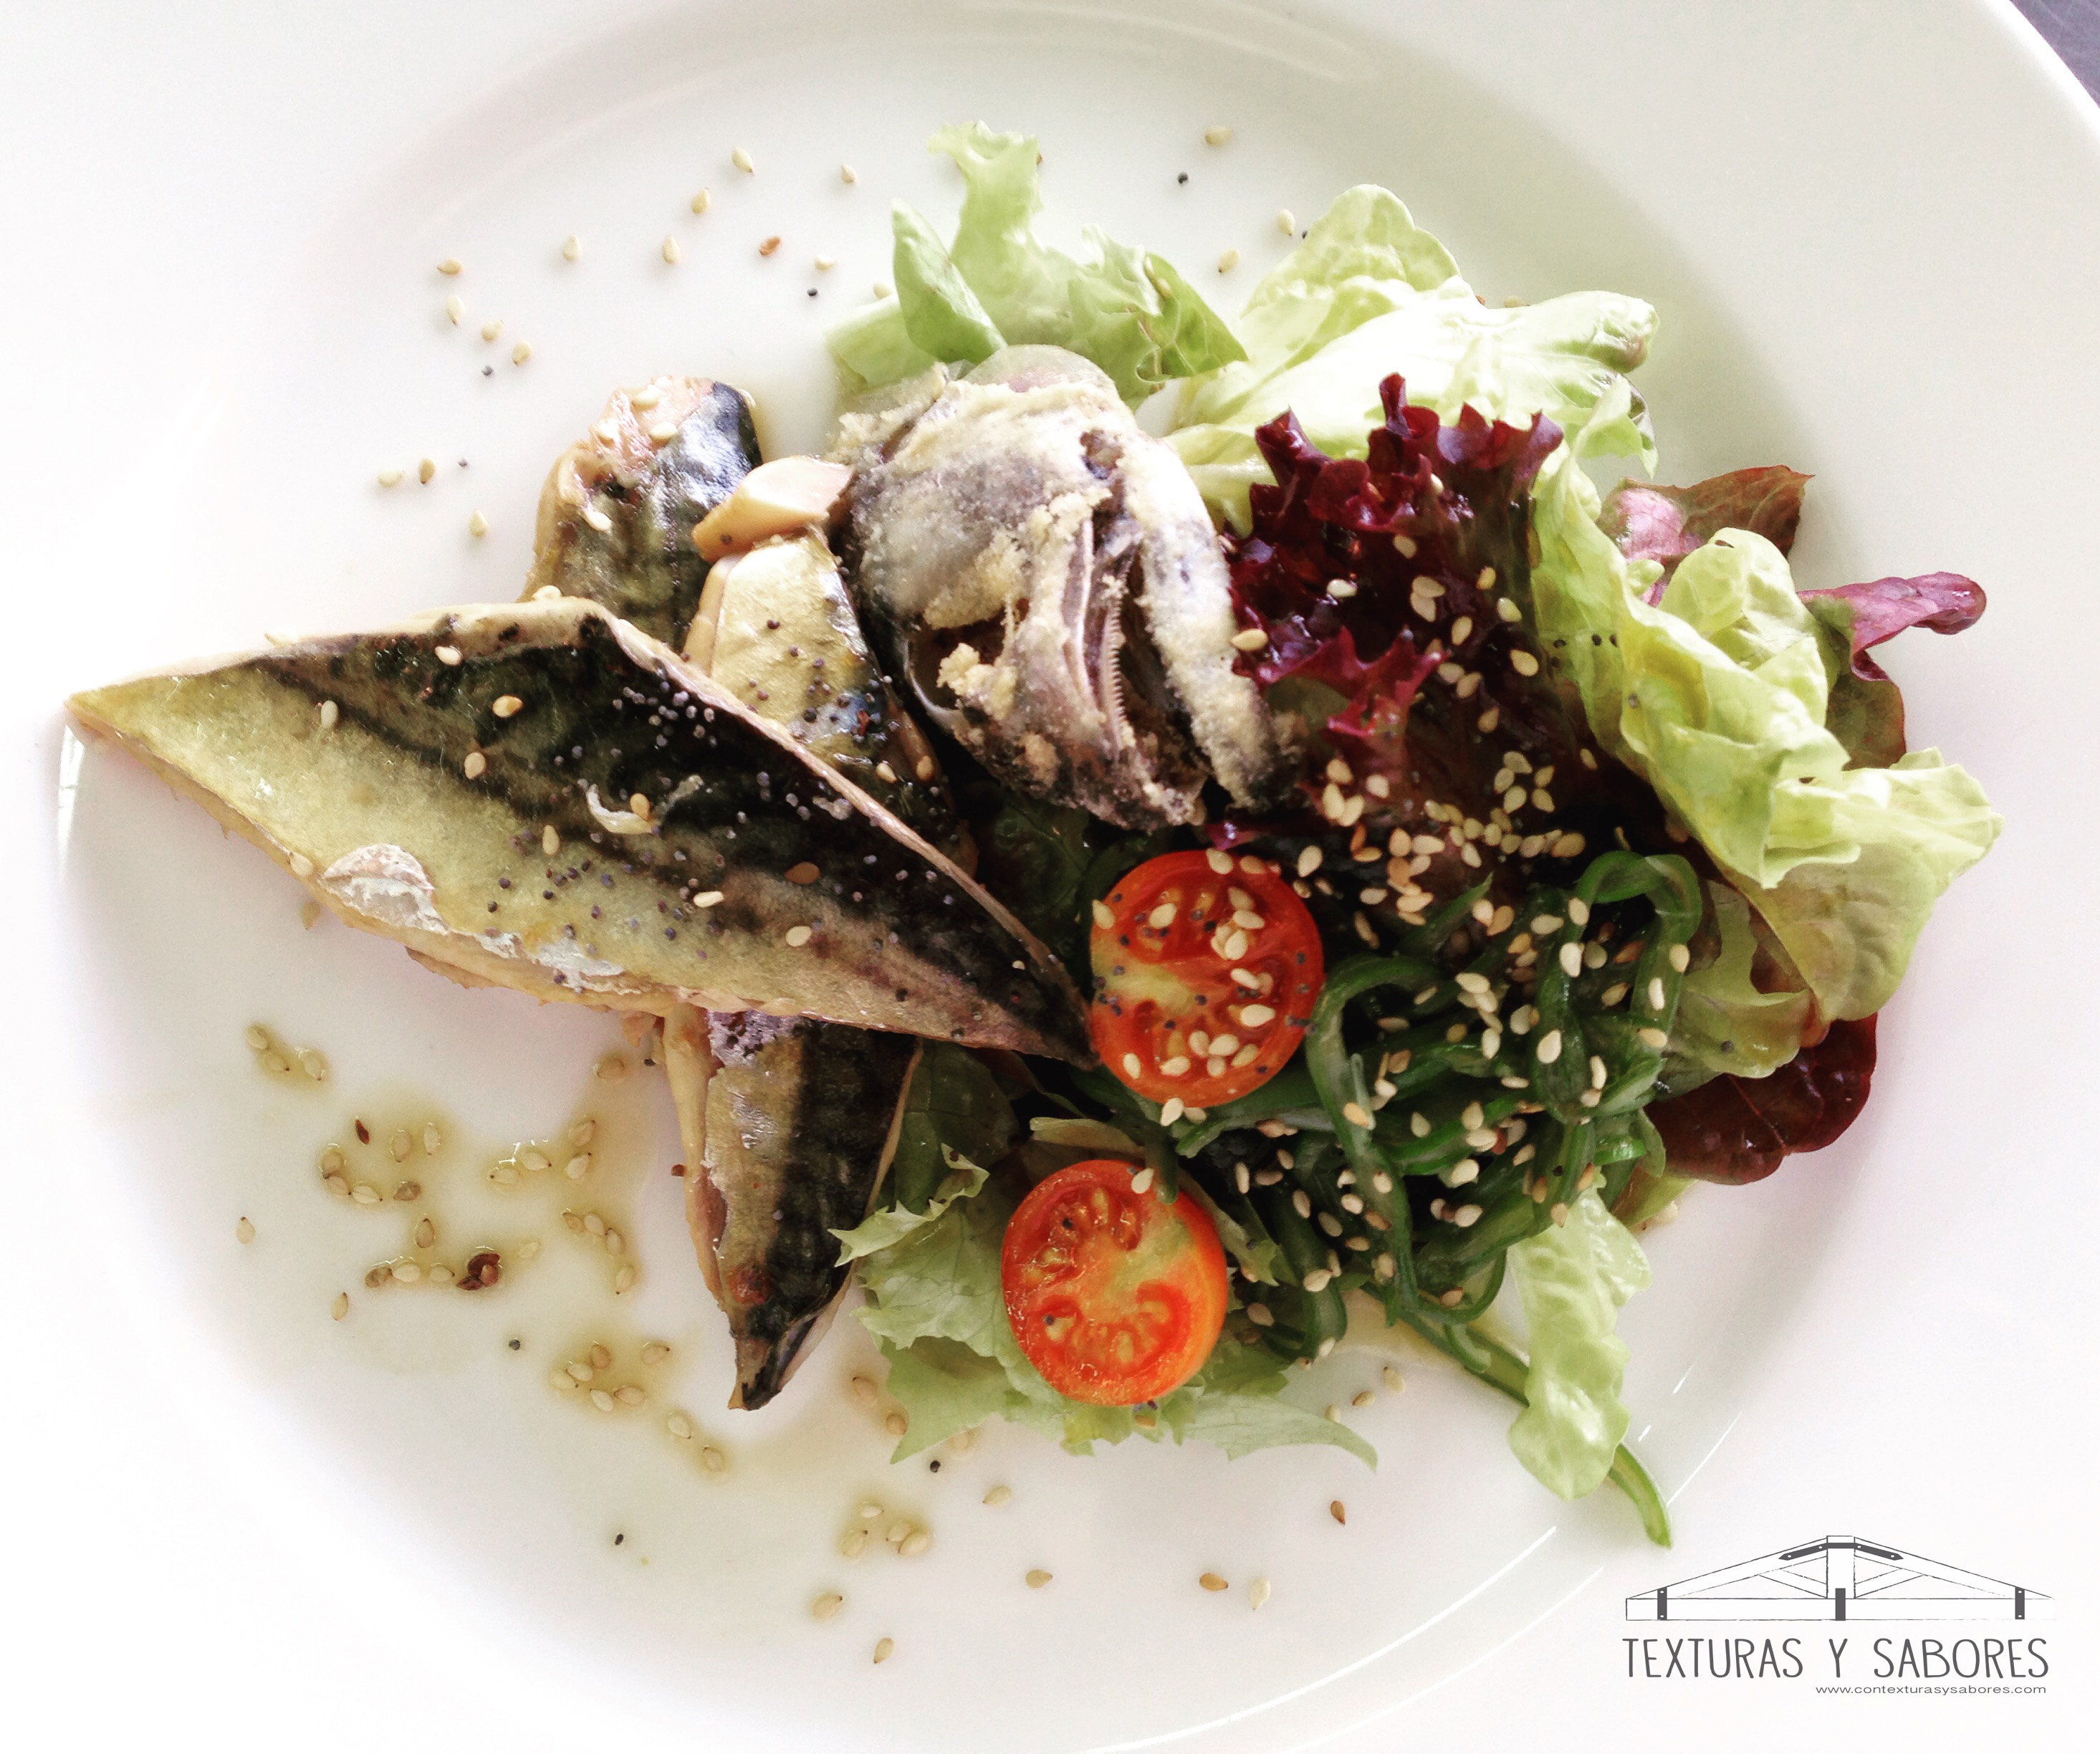 Caballa marinada con salsa teriyaki y algas wakame